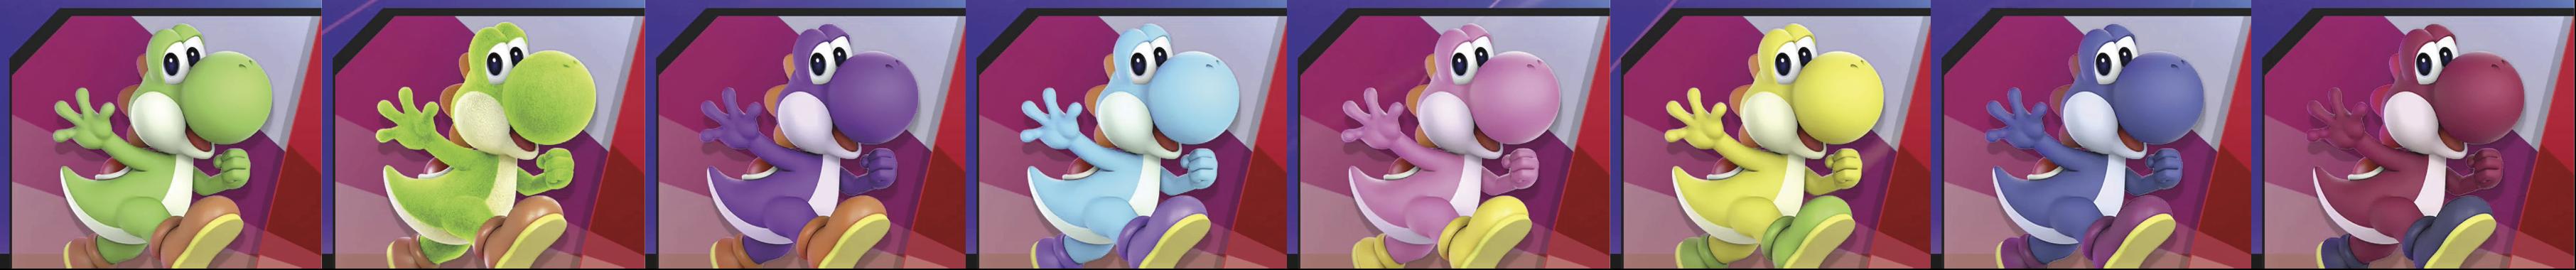 Yoshi (Super Smash Bros. Ultimate)